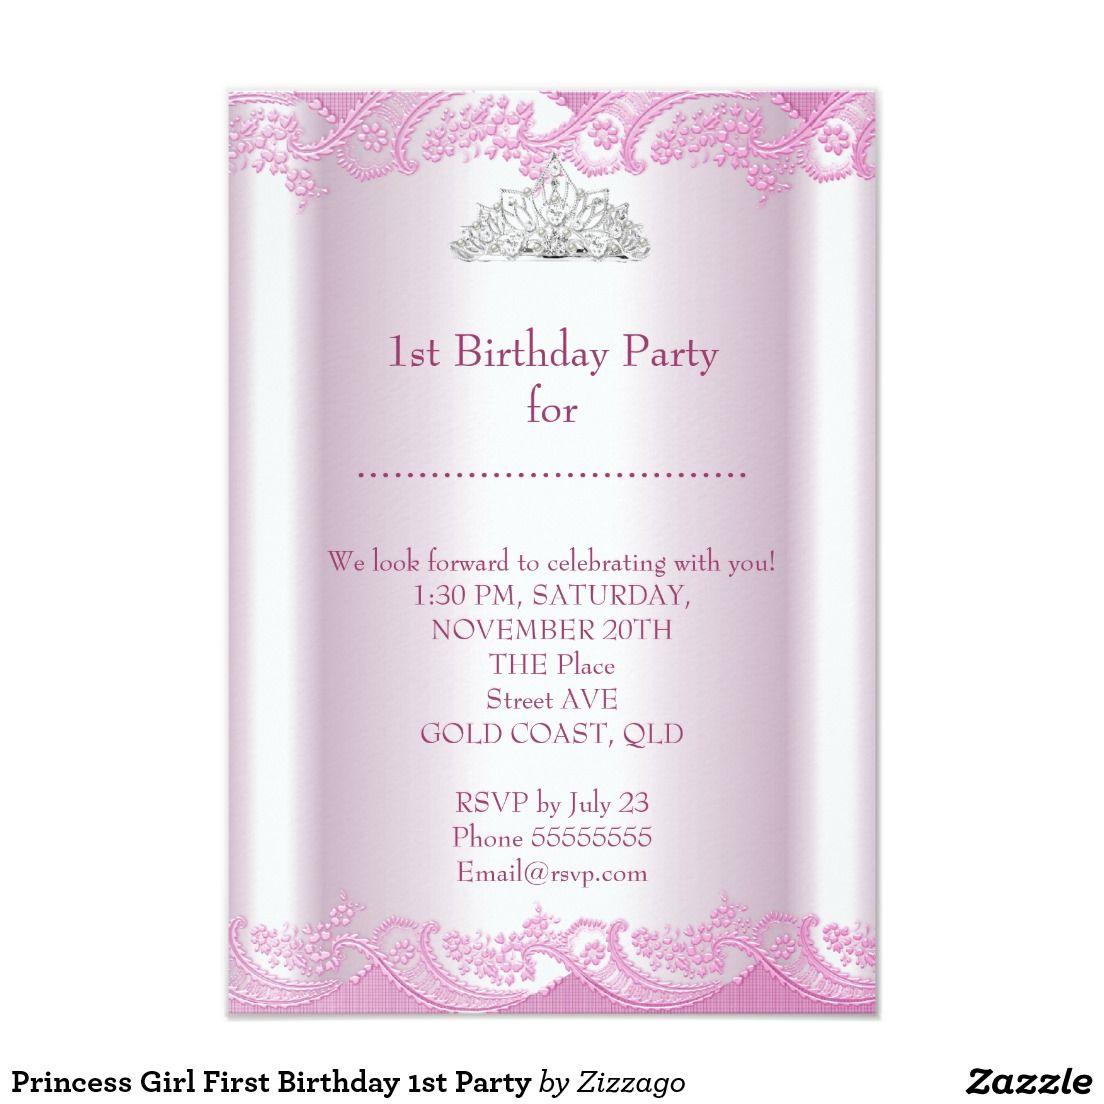 Princess Girl First Birthday 1st Party Invitation | First birthday ...